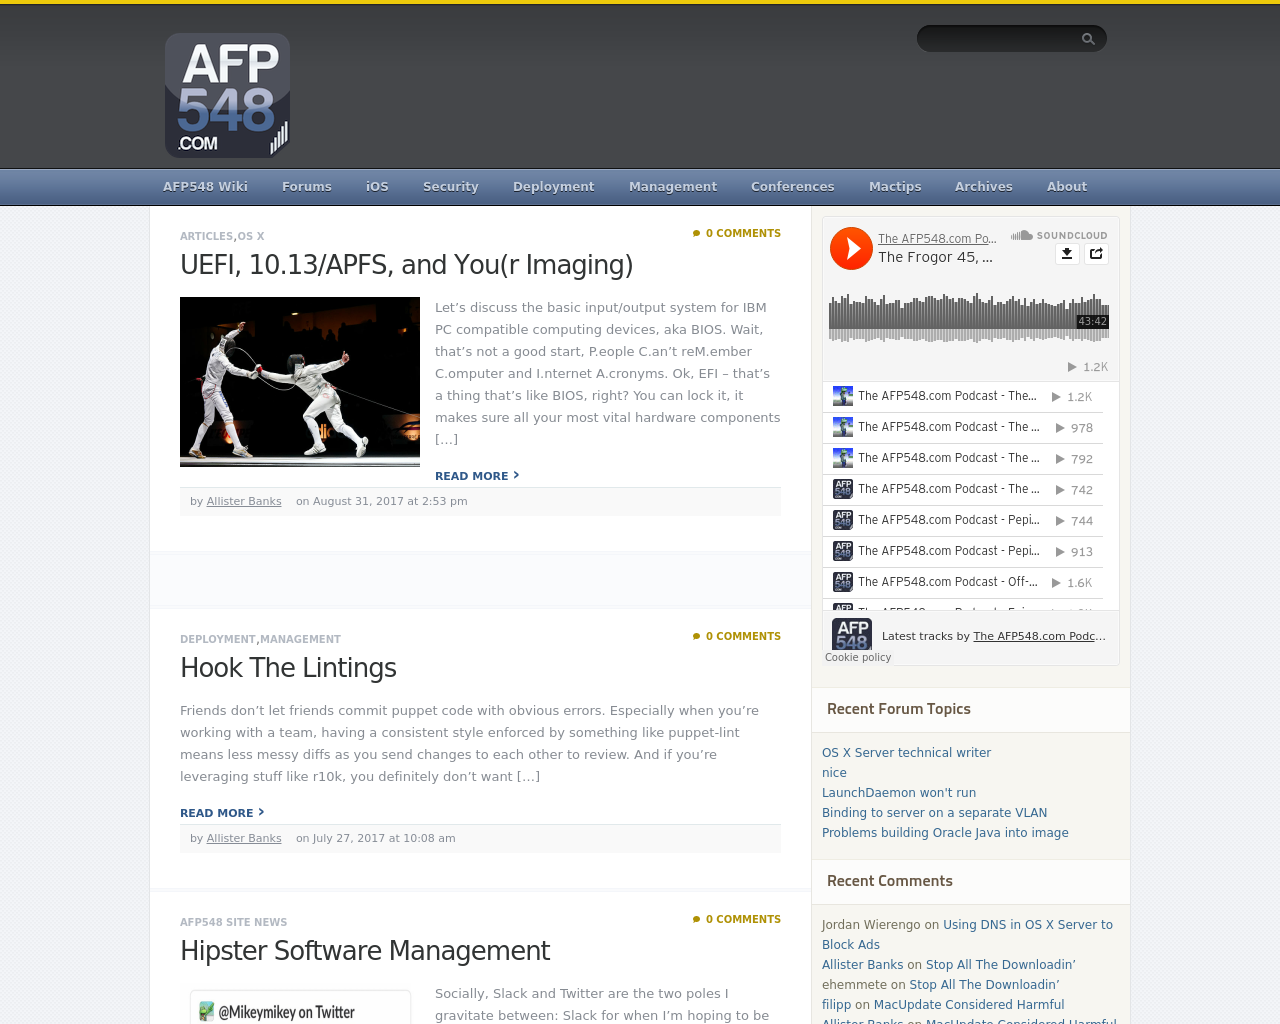 afp548.com-Advertising-Reviews-Pricing